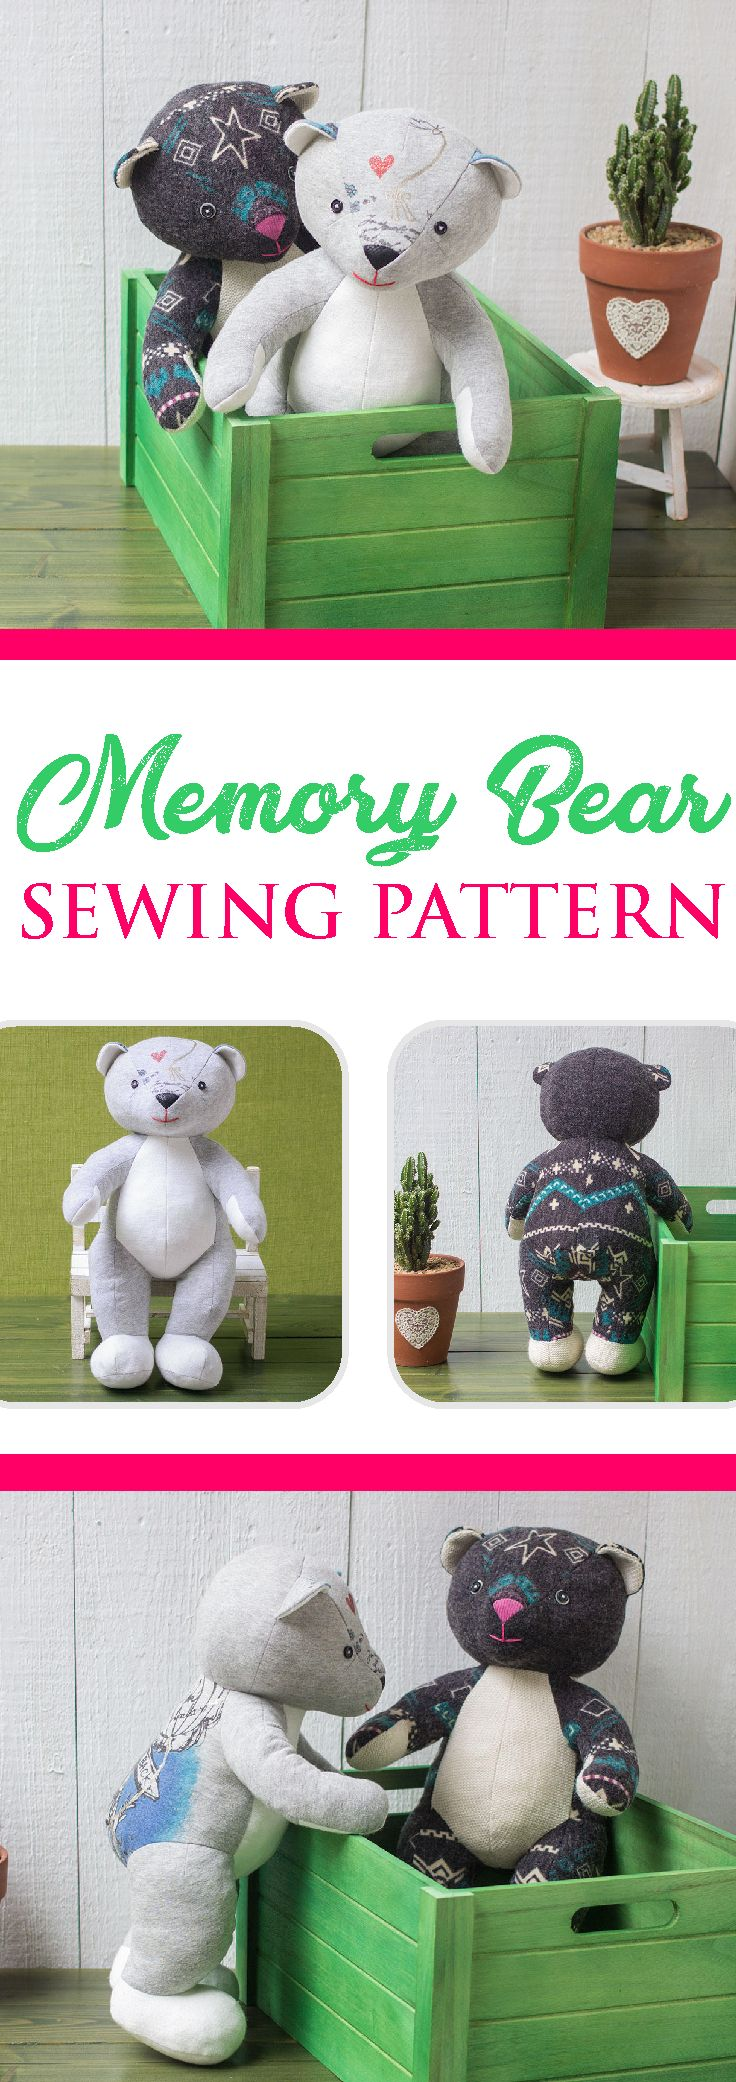 Memory Bear Sewing Pattern Plush